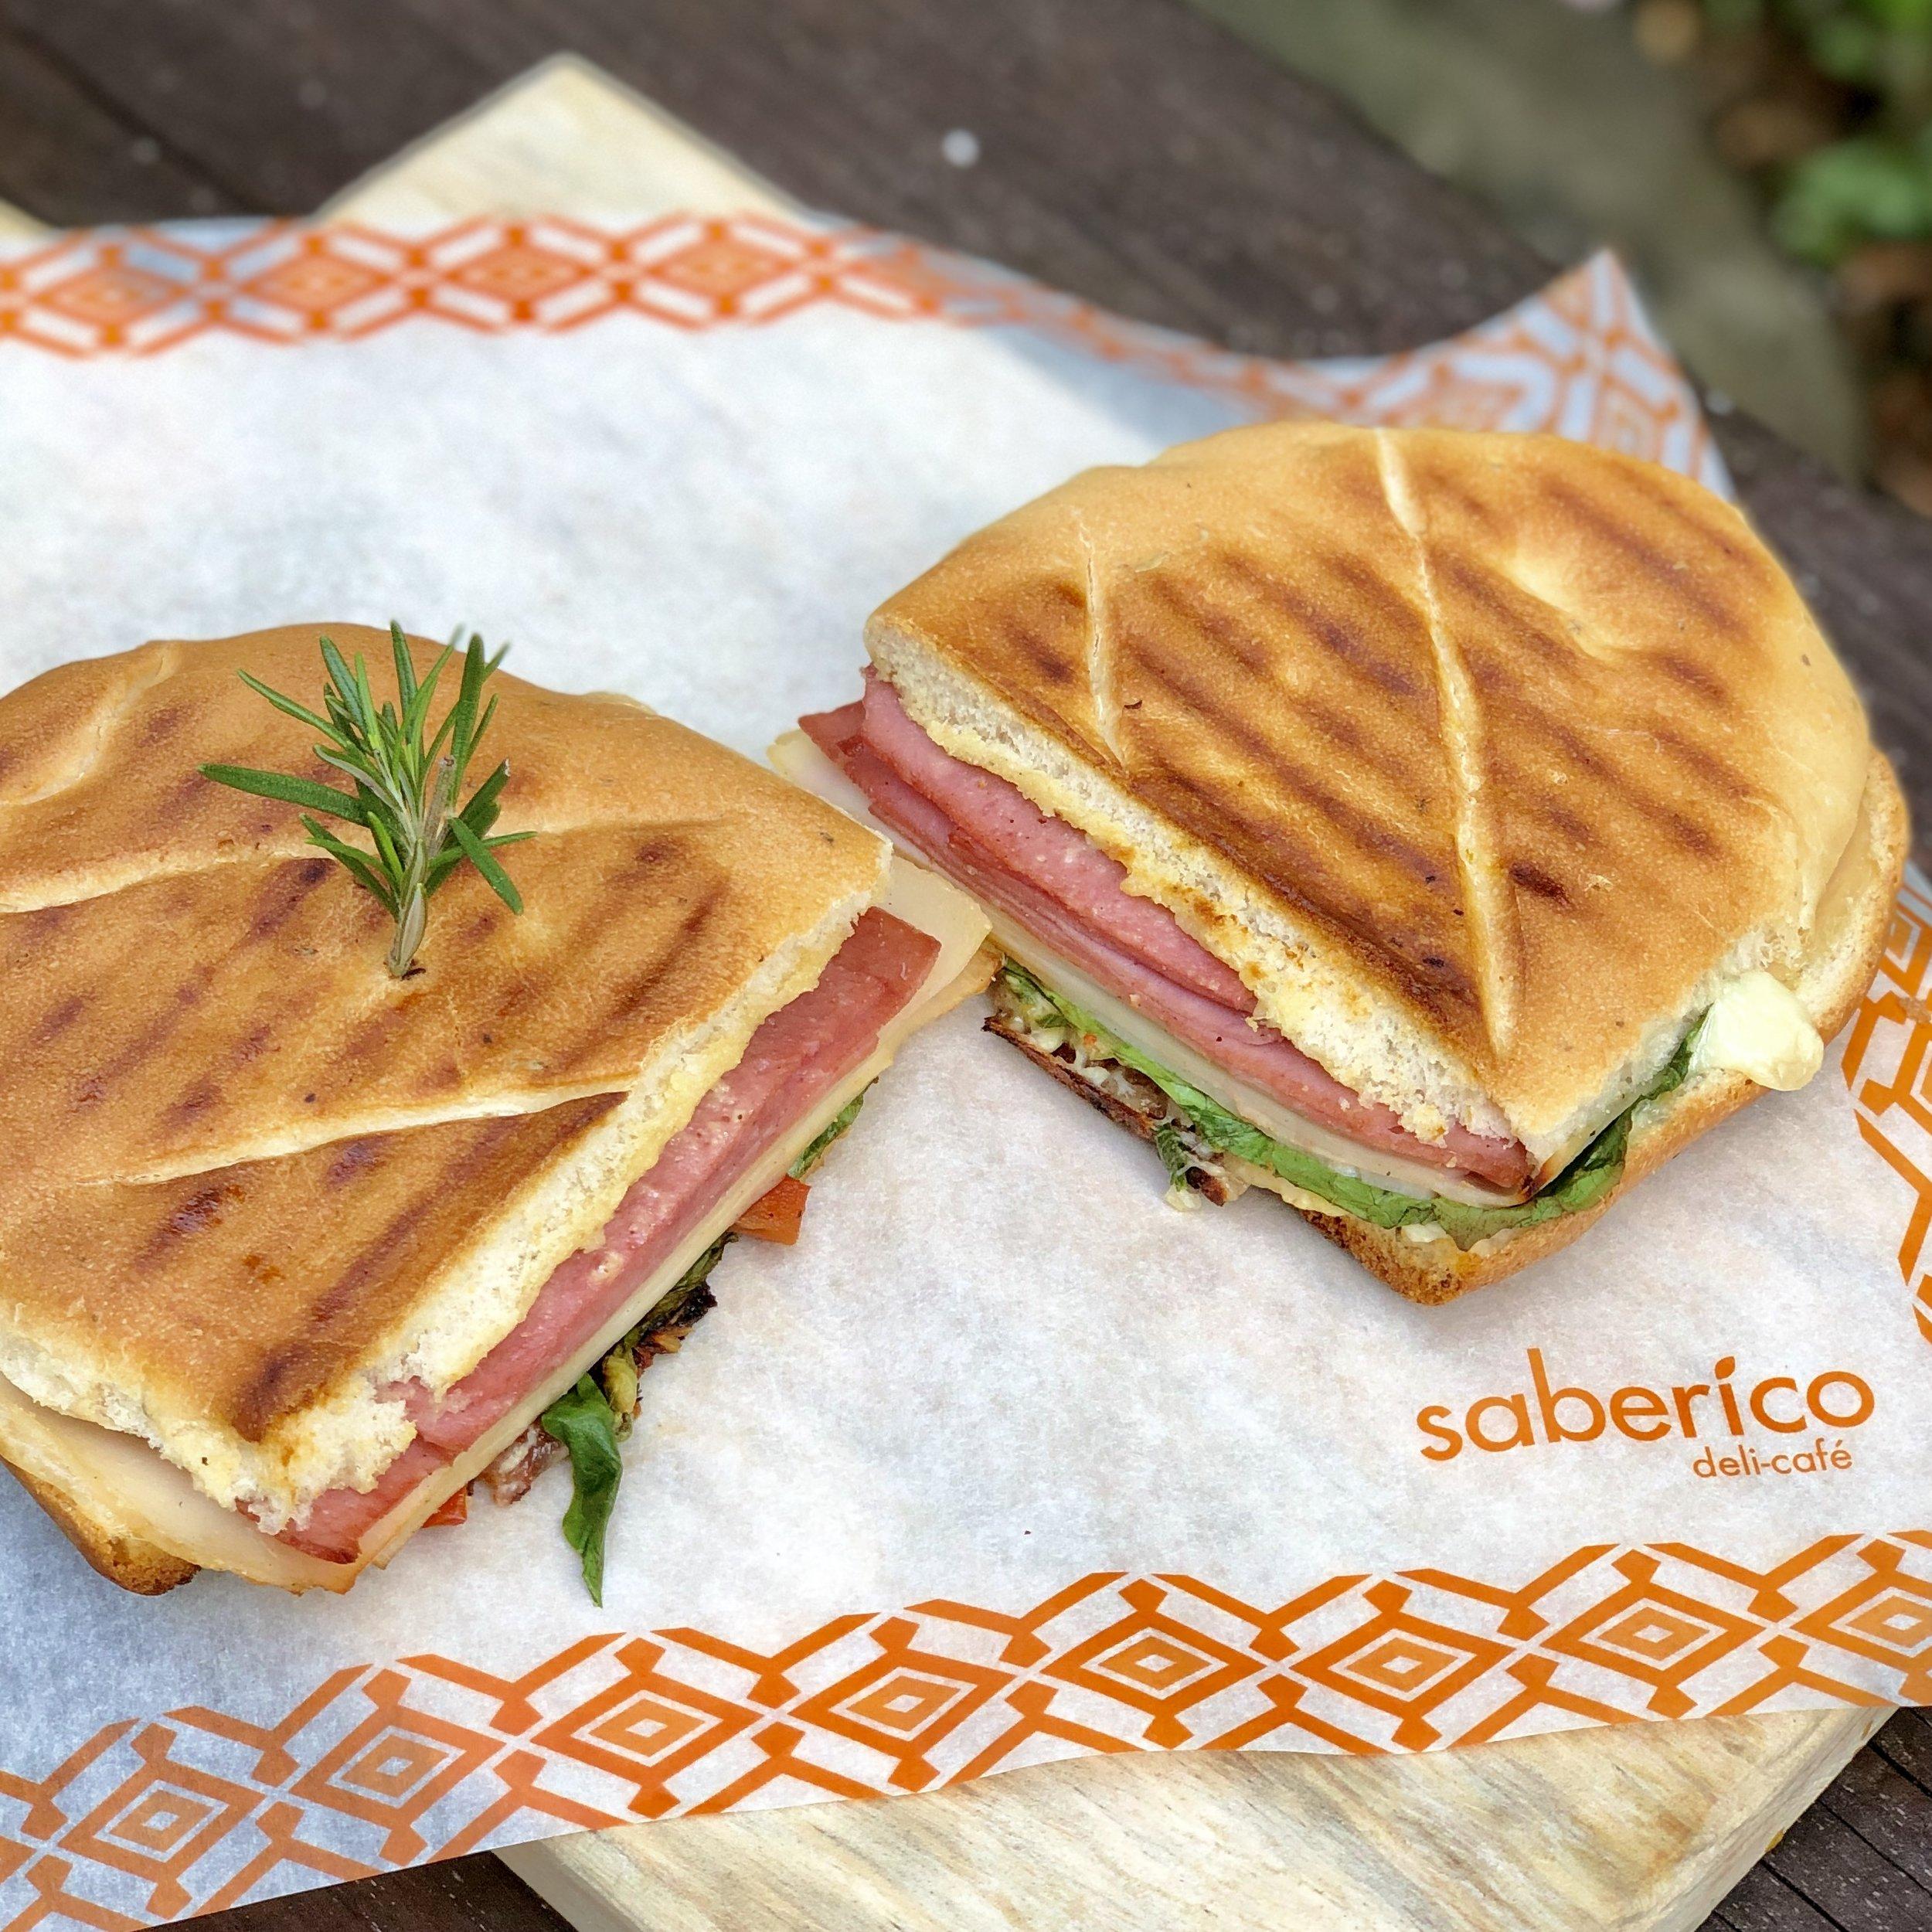 sandwich-3-jamones-saberico.jpg